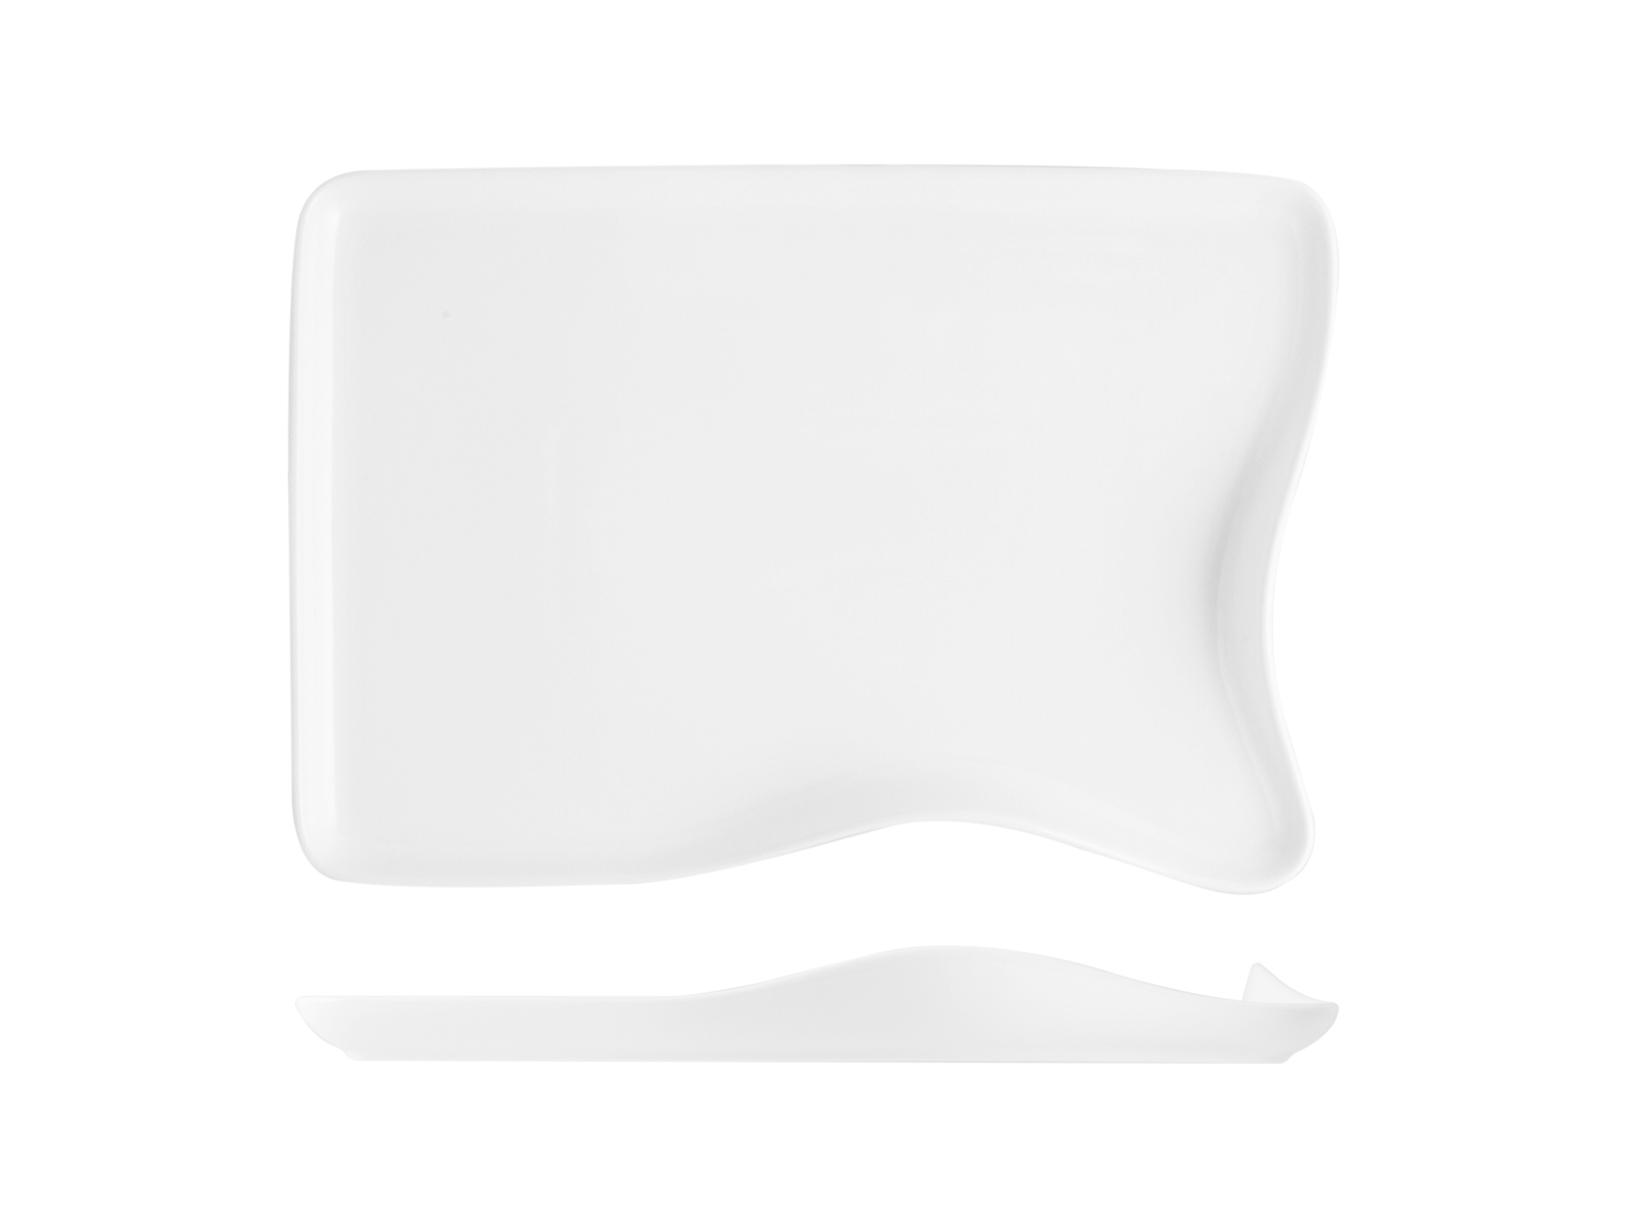 Acquista Piatto Porcellana Sagom 30 5x21 17527677 | Glooke.com